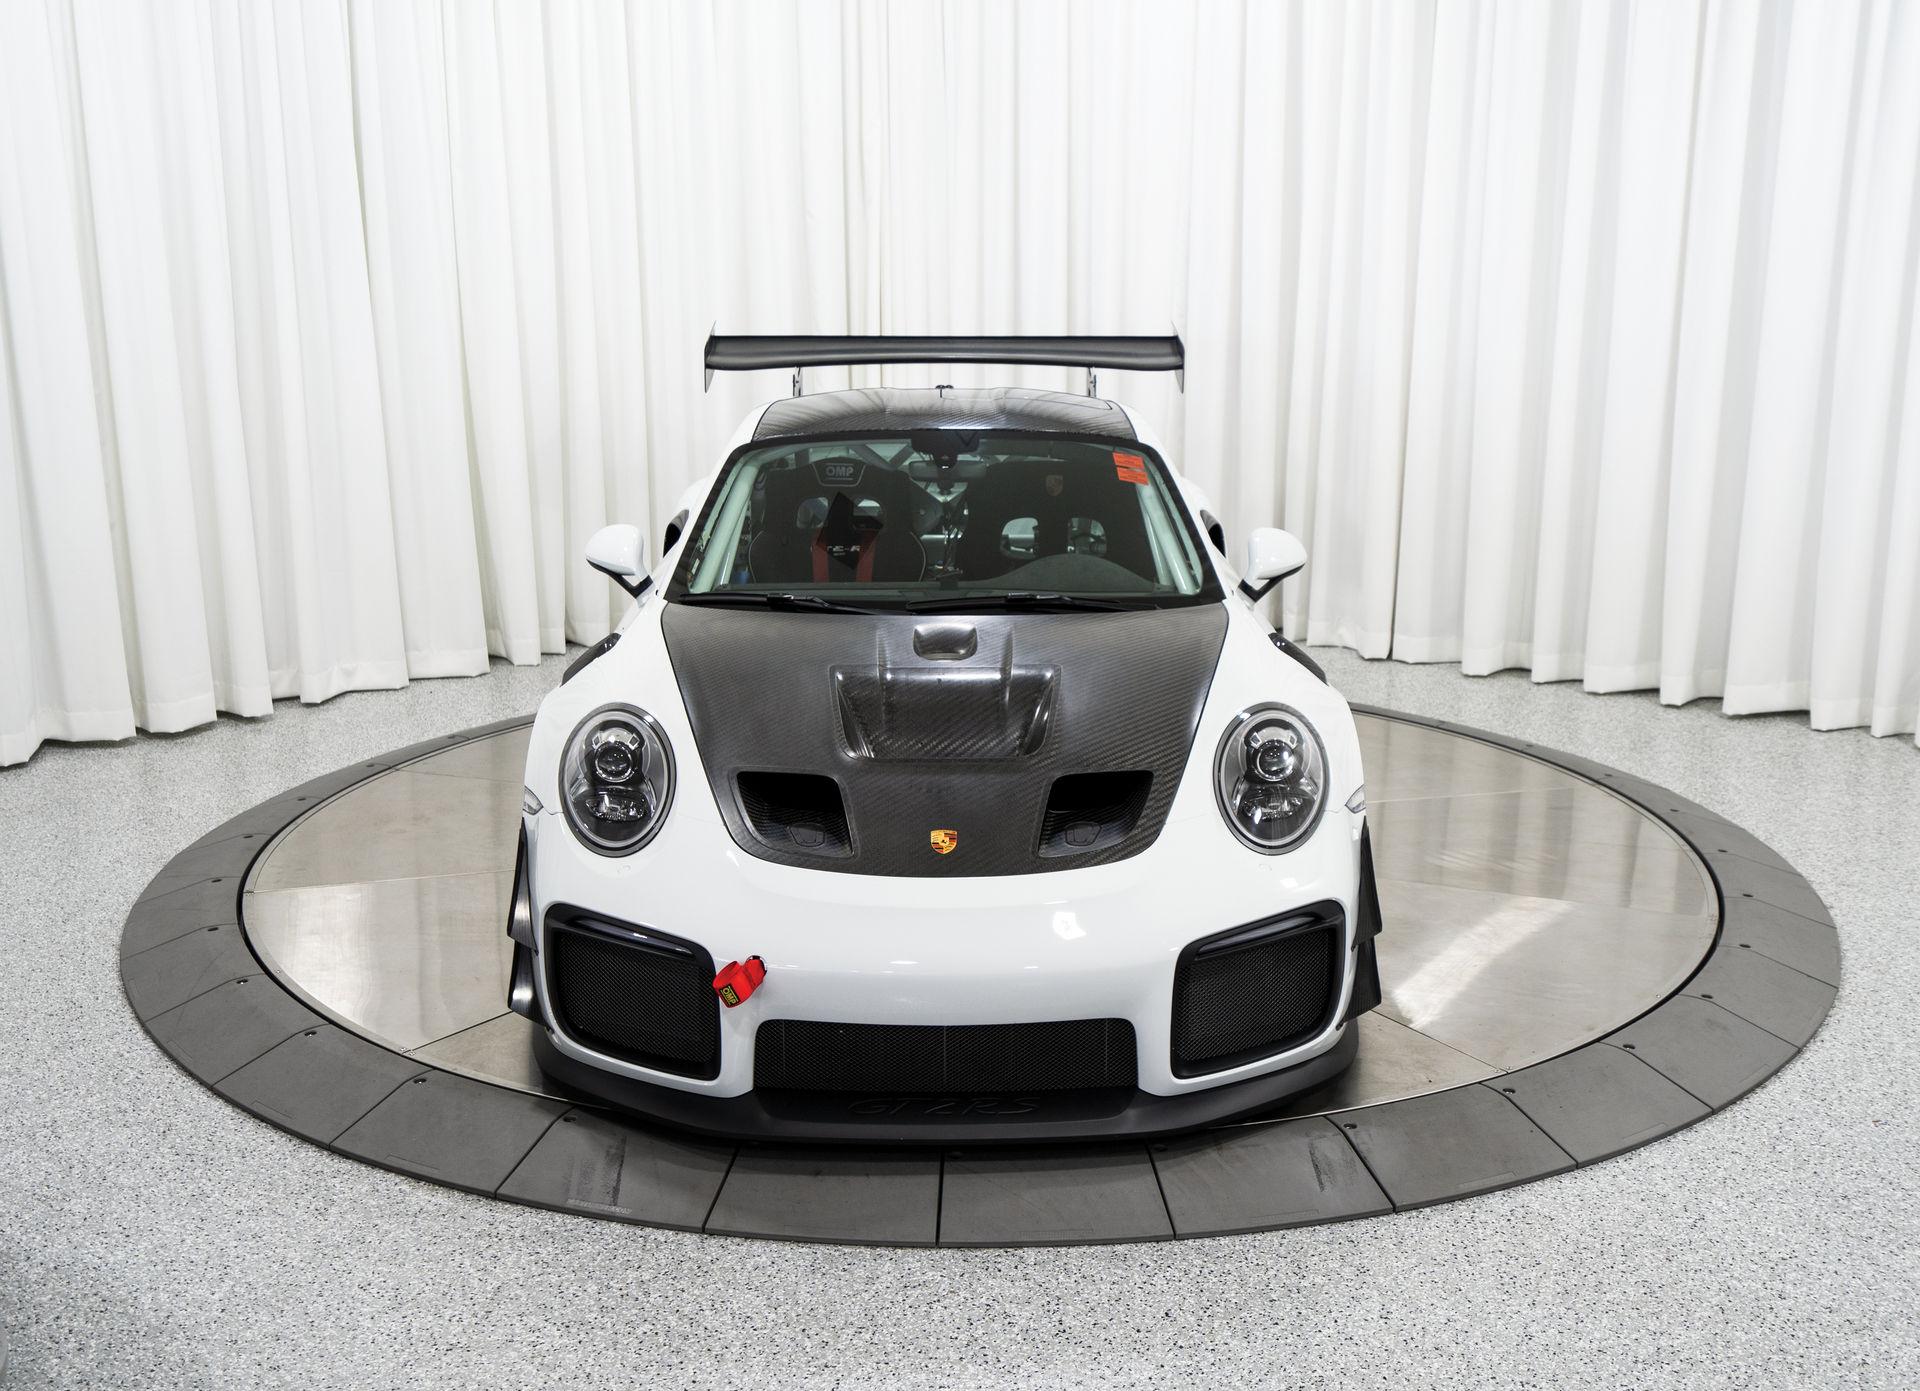 Porsche-911-GT2-RS-Clubsport-auction-2